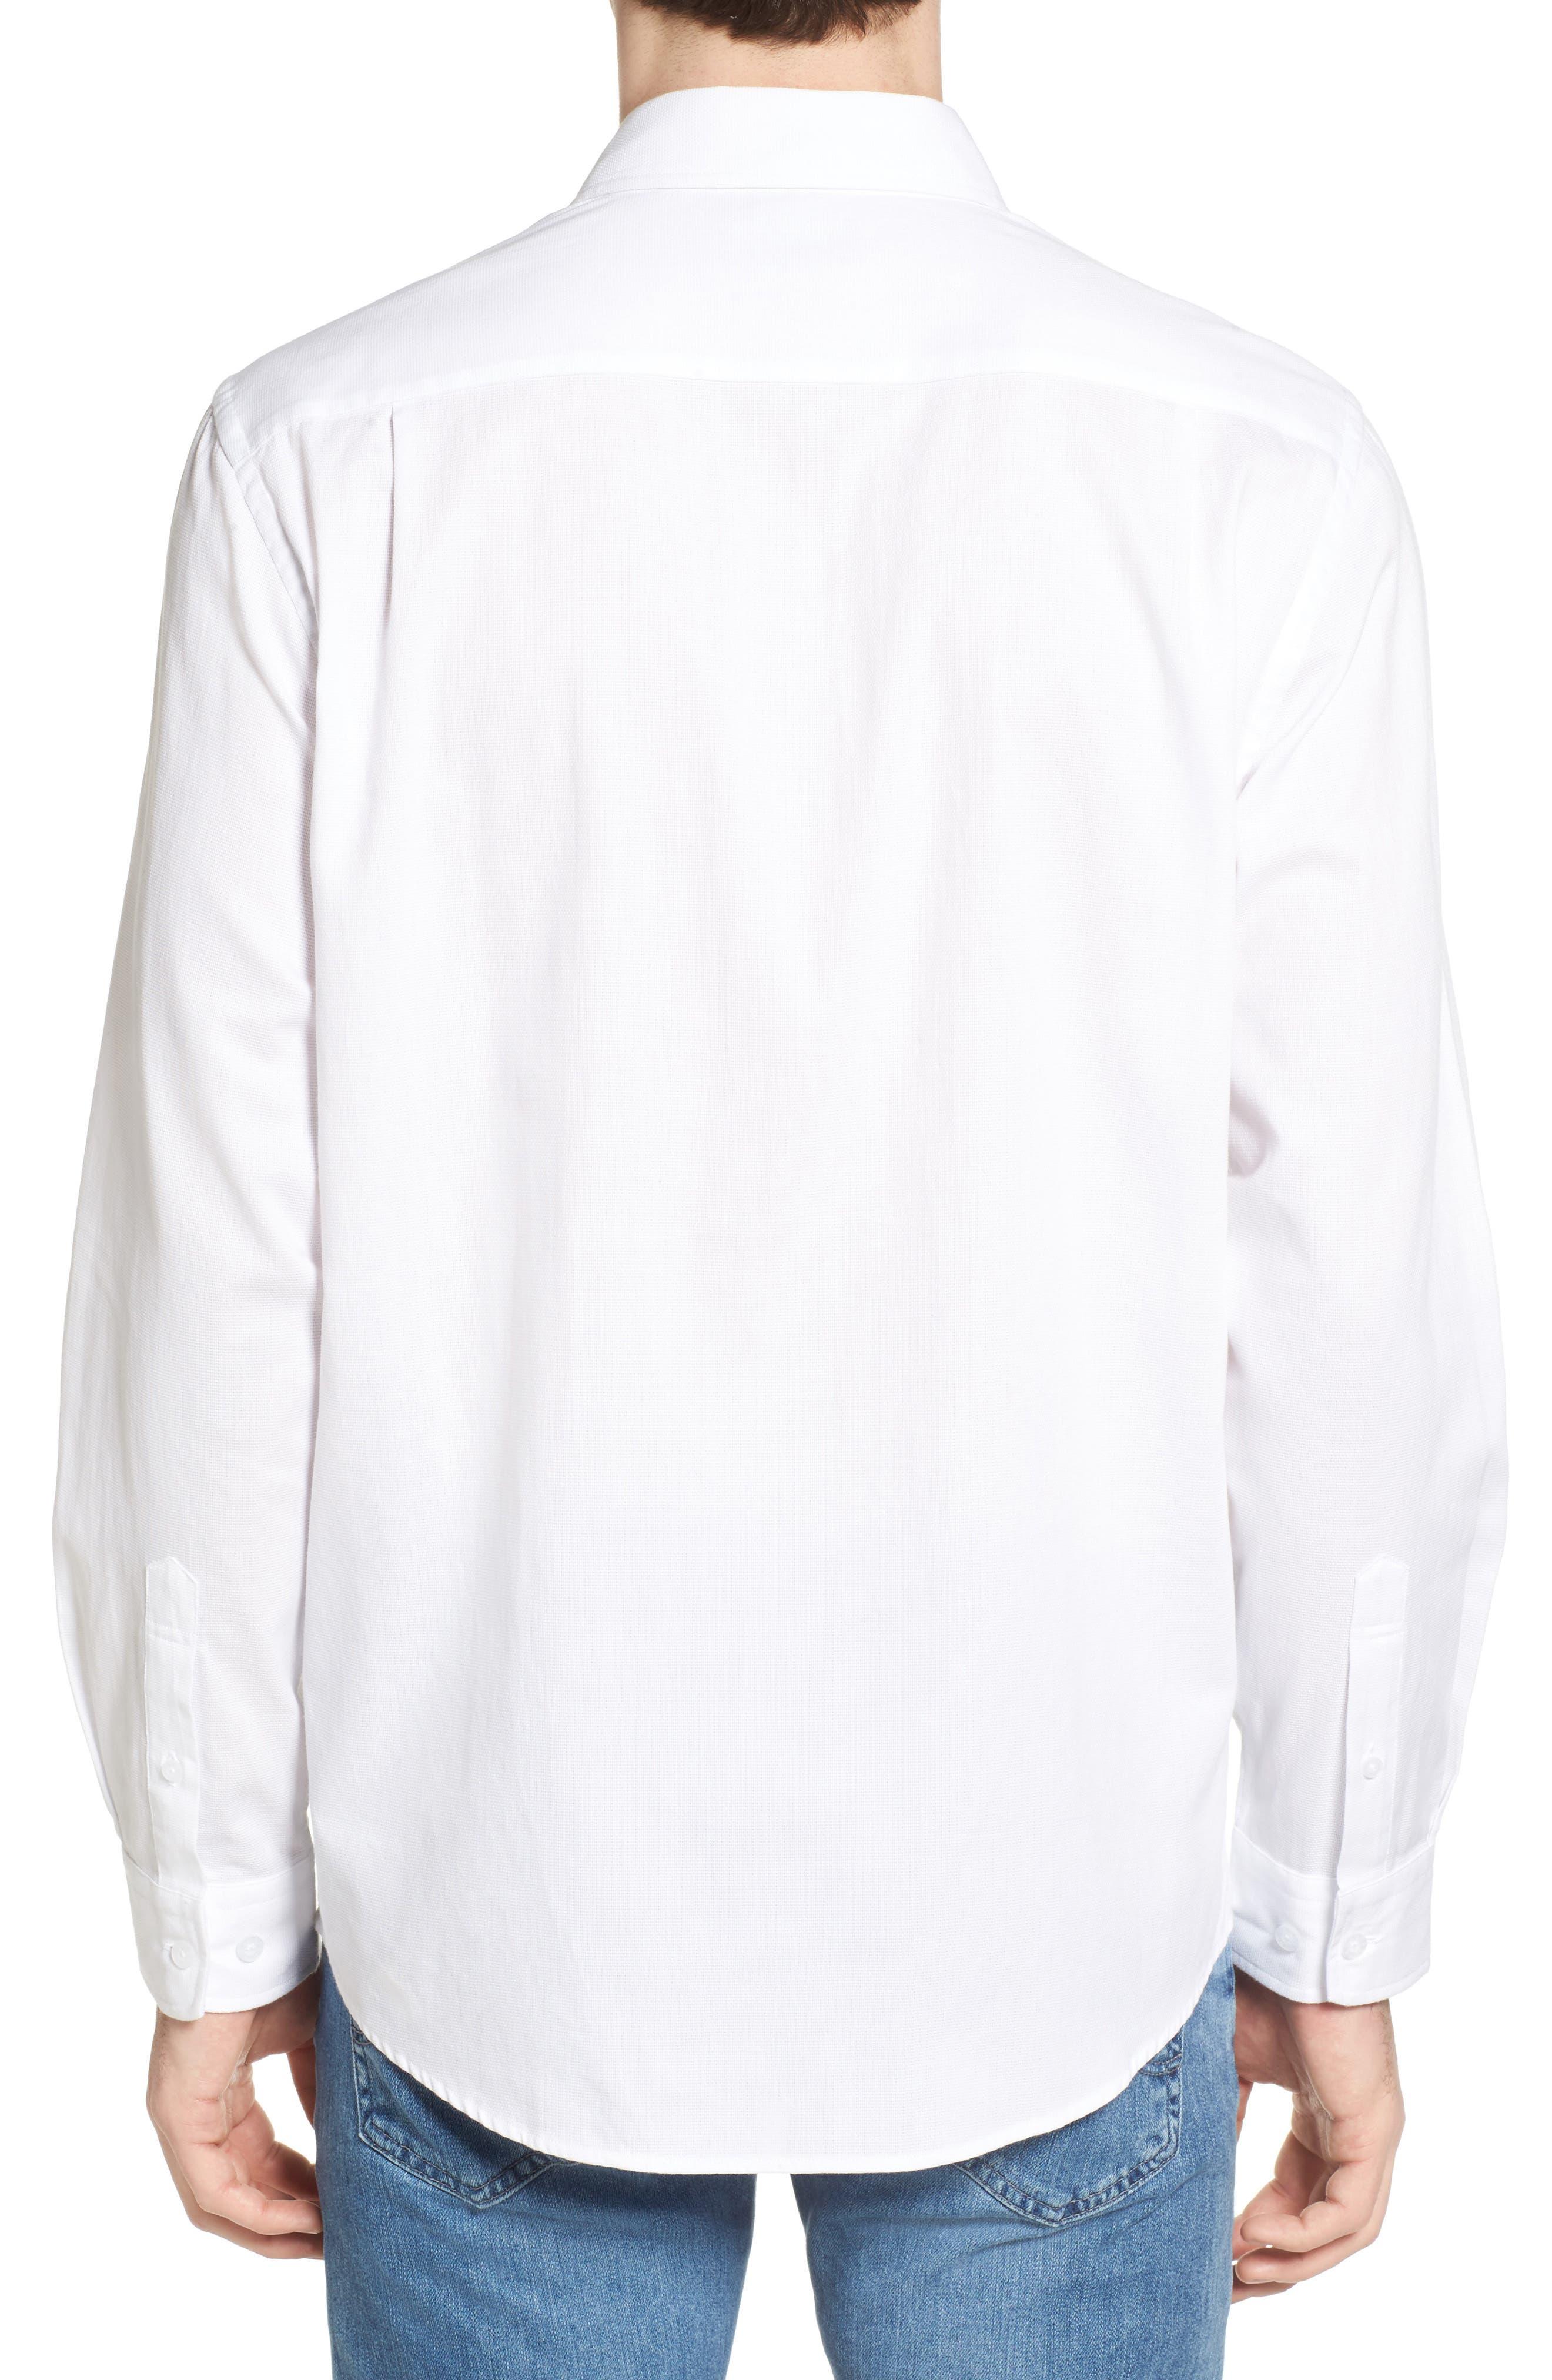 Mount Hutton Sport Shirt,                             Alternate thumbnail 3, color,                             Snow